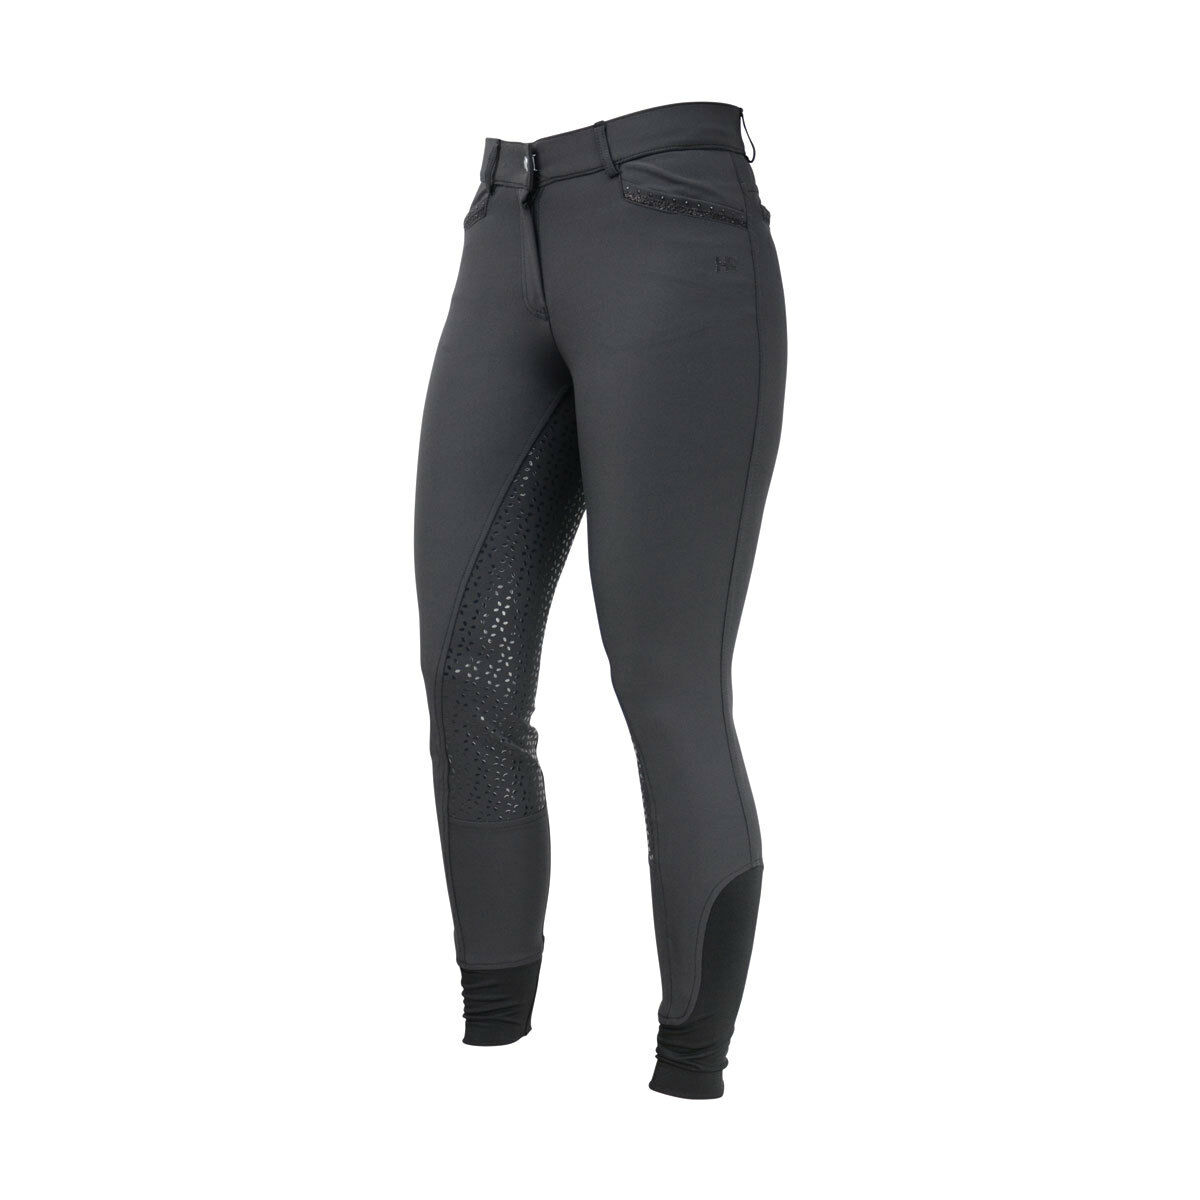 Hyfashion Roka Pantalones  De Montar De Cristal 26  Negro Negro Cristal 13984  tienda de venta